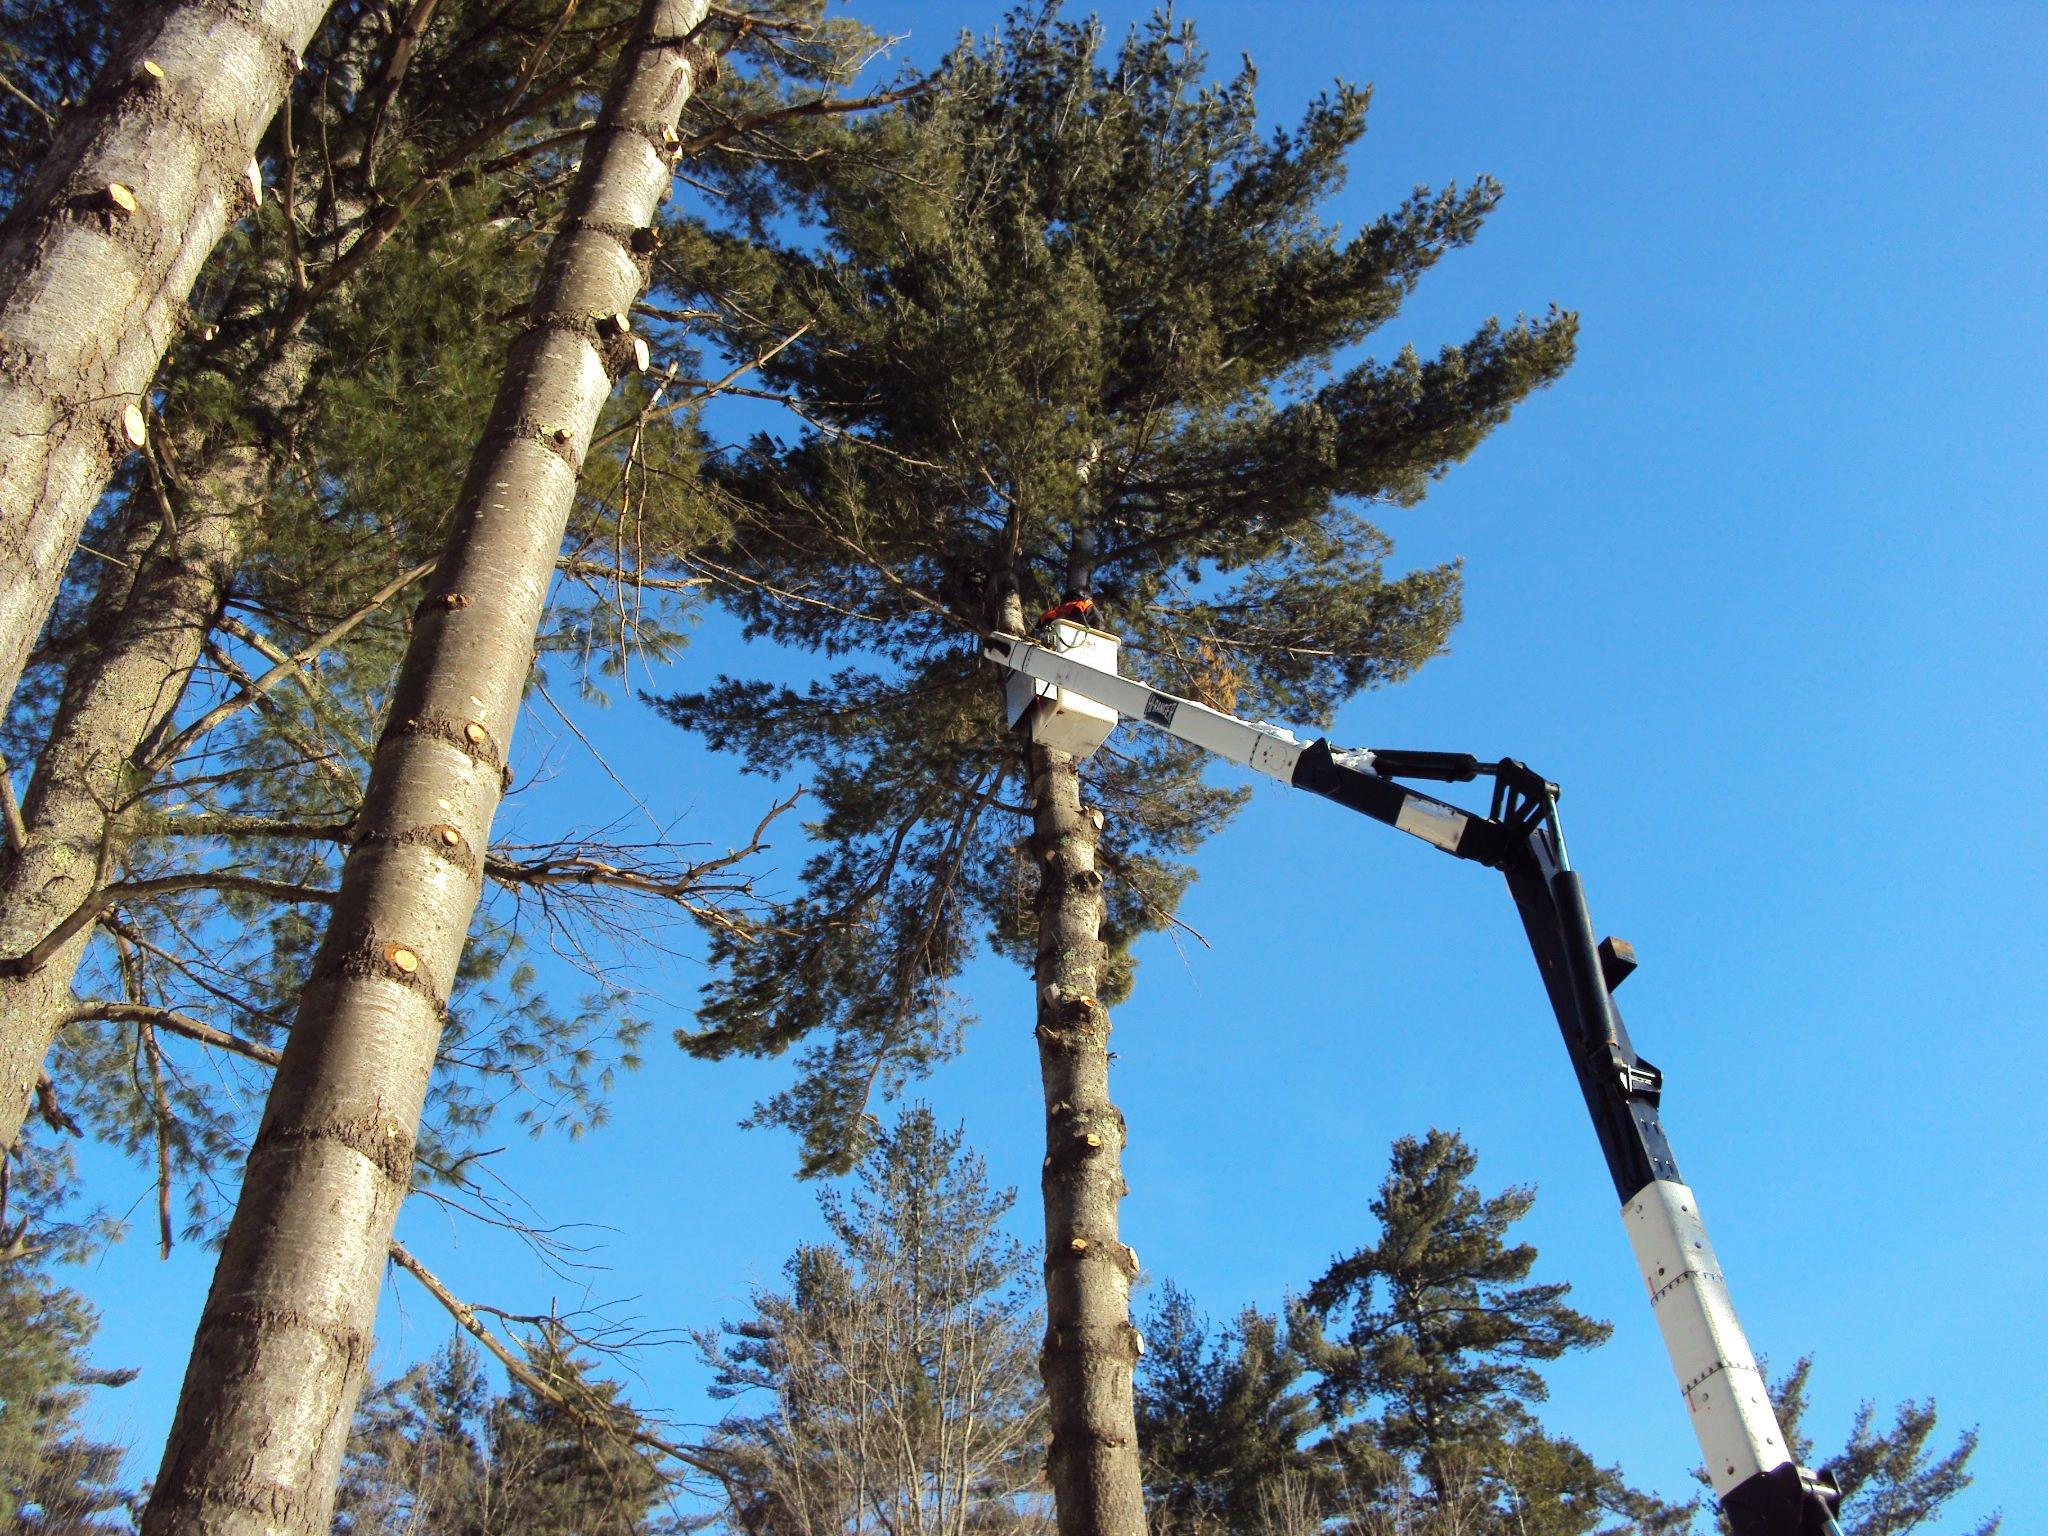 Bucket Truck Tree Service